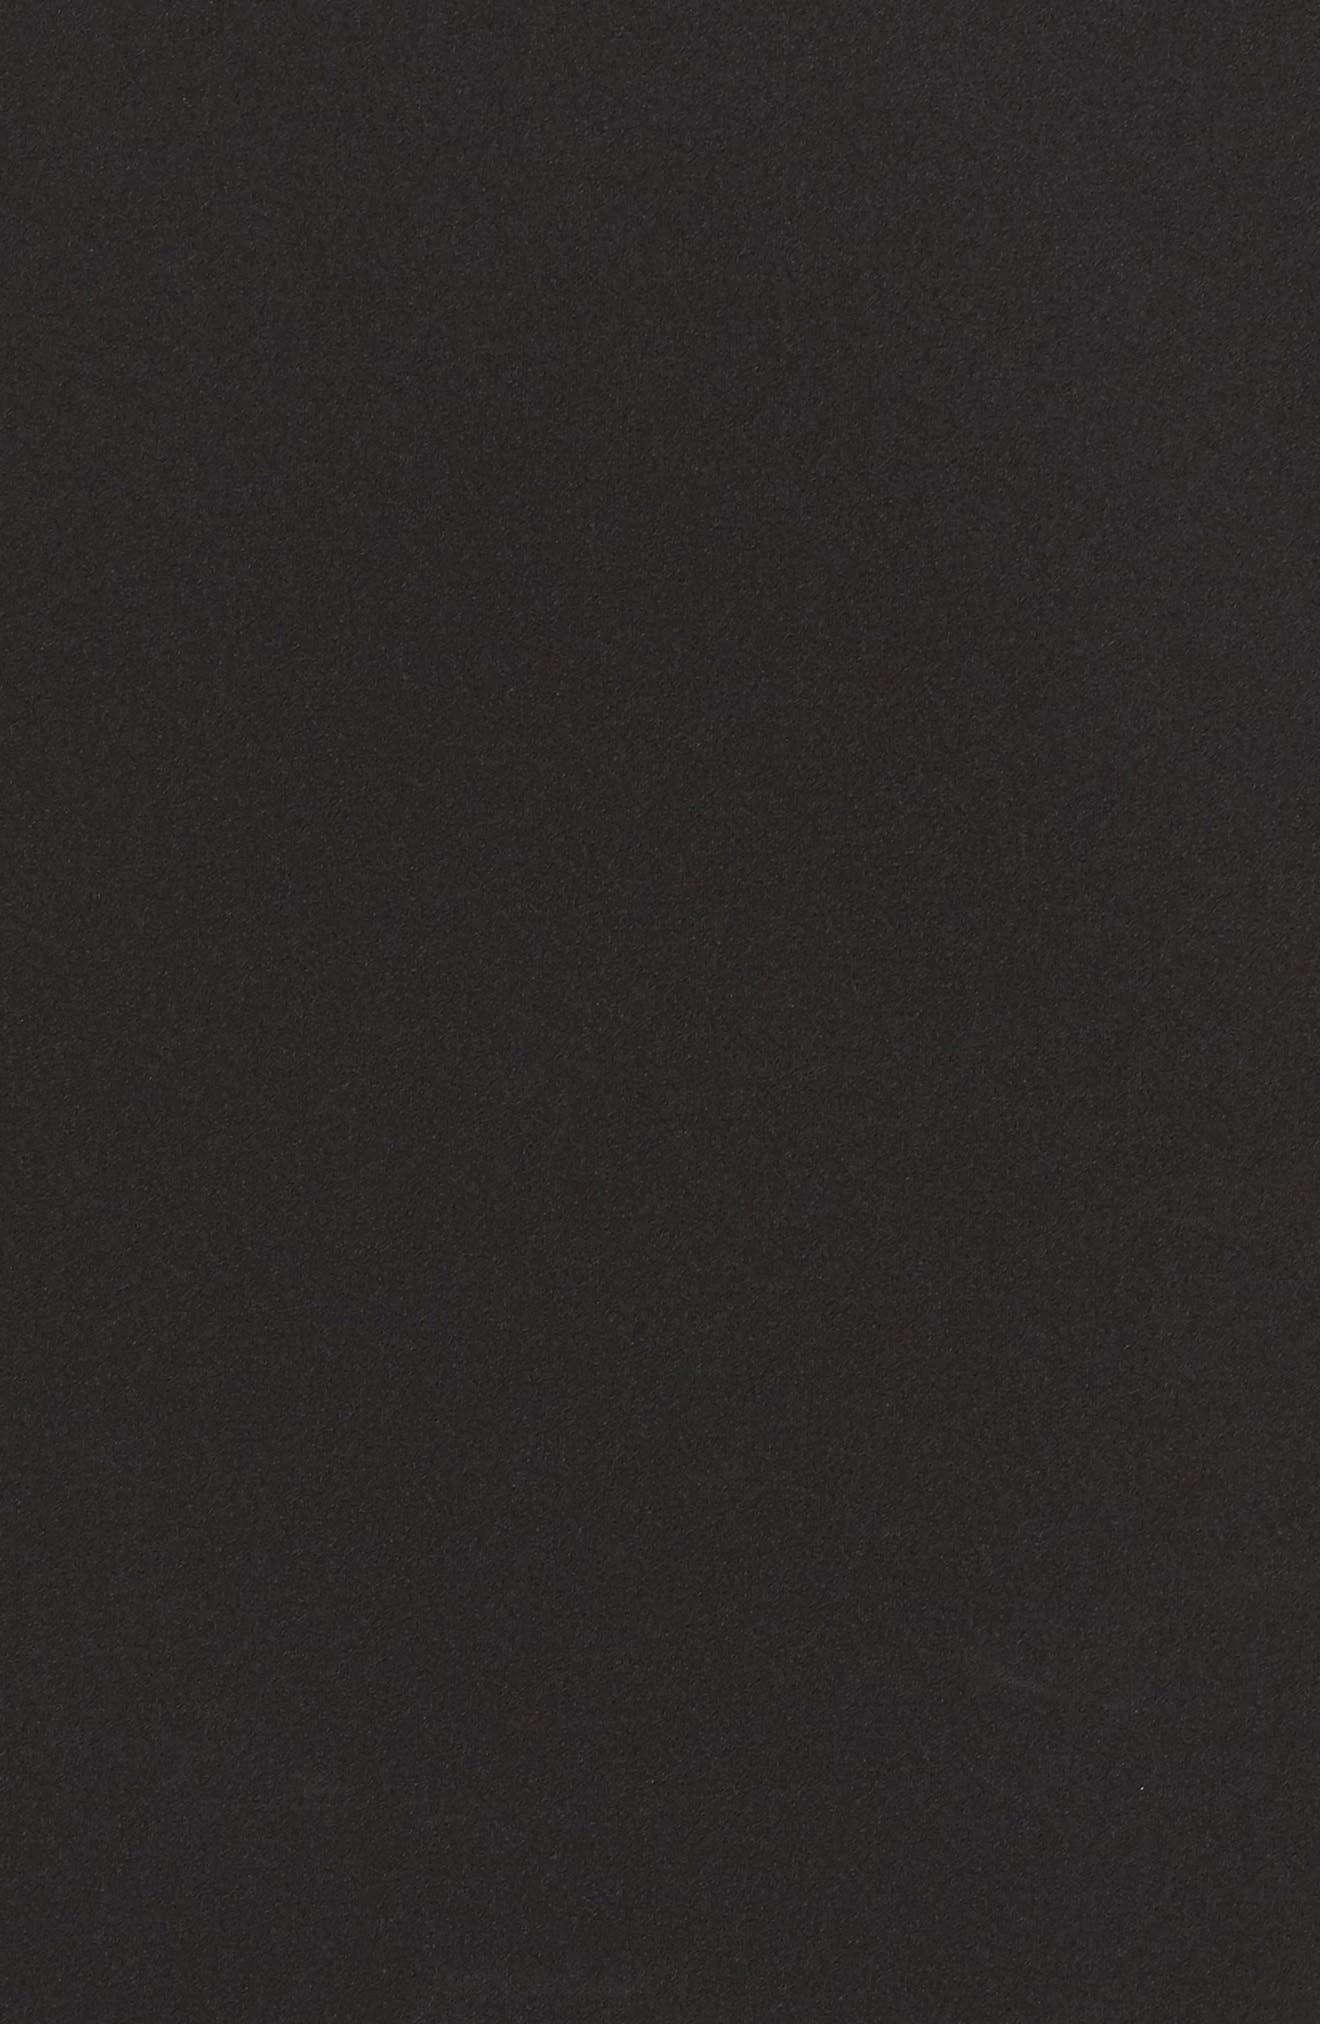 Off the Shoulder Sheath Dress,                             Alternate thumbnail 5, color,                             Black